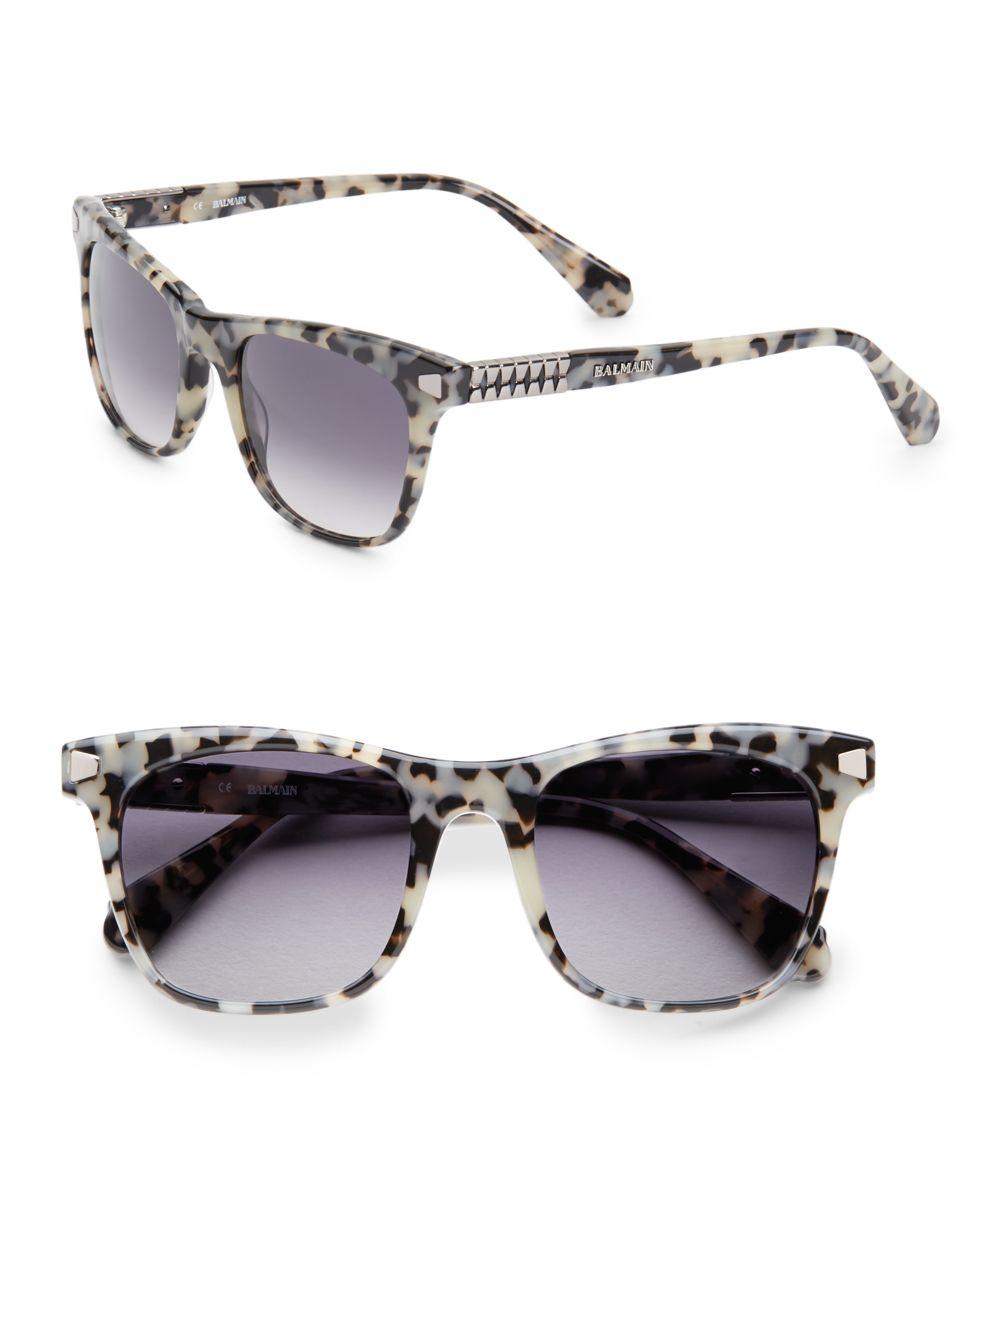 df9cfa1c8b0d2 Balmain 52Mm Tortoise Shell Wayfarer Sunglasses - Lyst